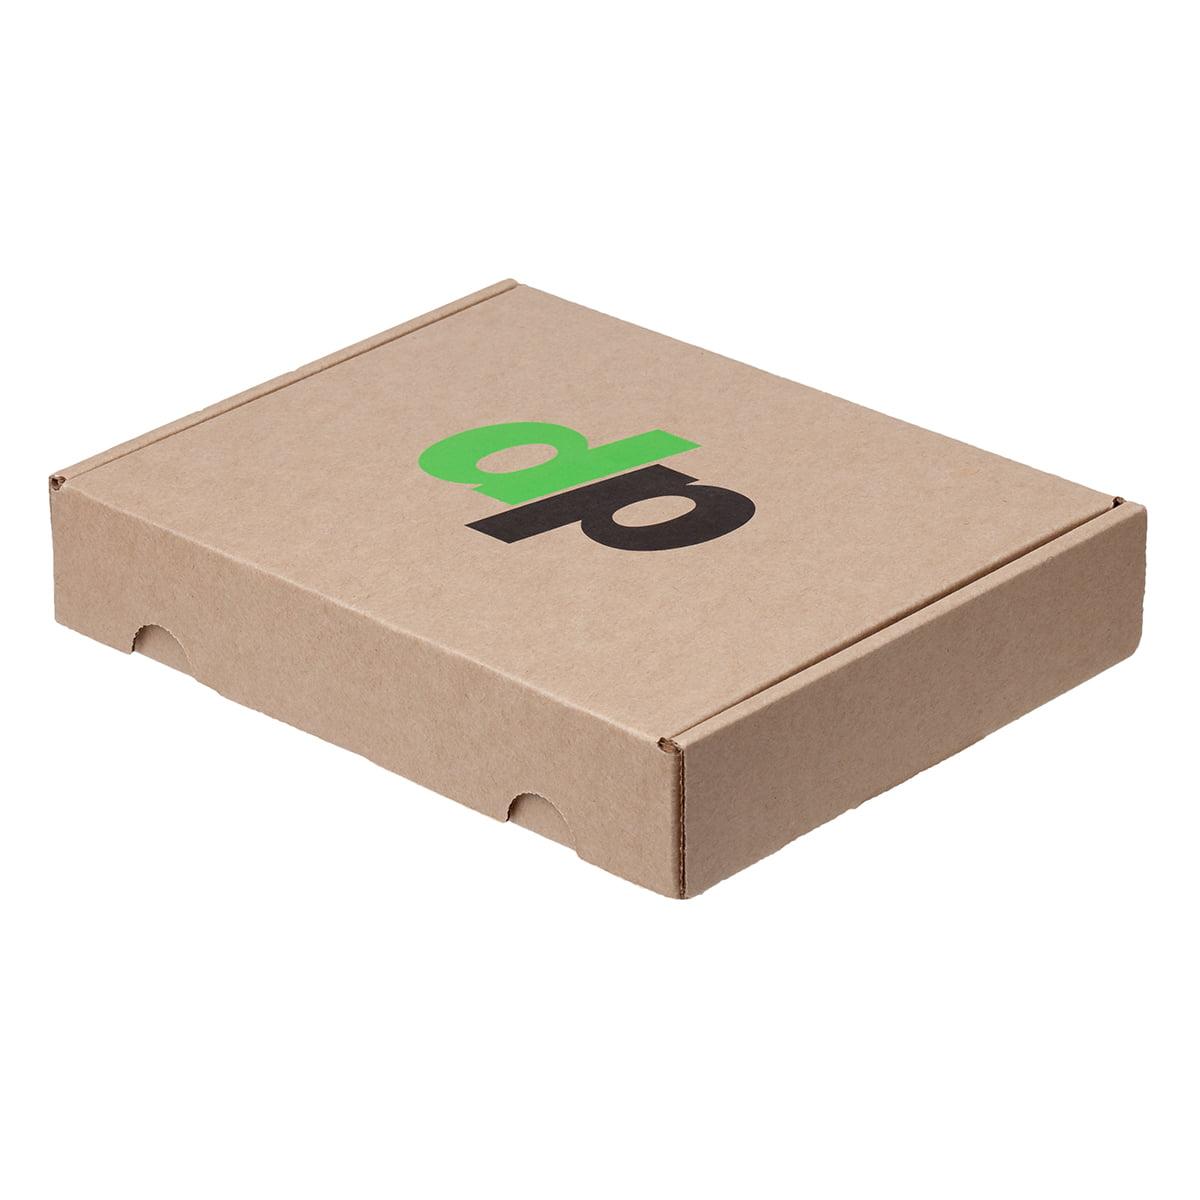 DPAccessories D5148P-2305//24 24 Black 14x1.5 Closed End Duplex XL Spline Lug Nuts for Aftermarket Wheels Wheel Lug Nut